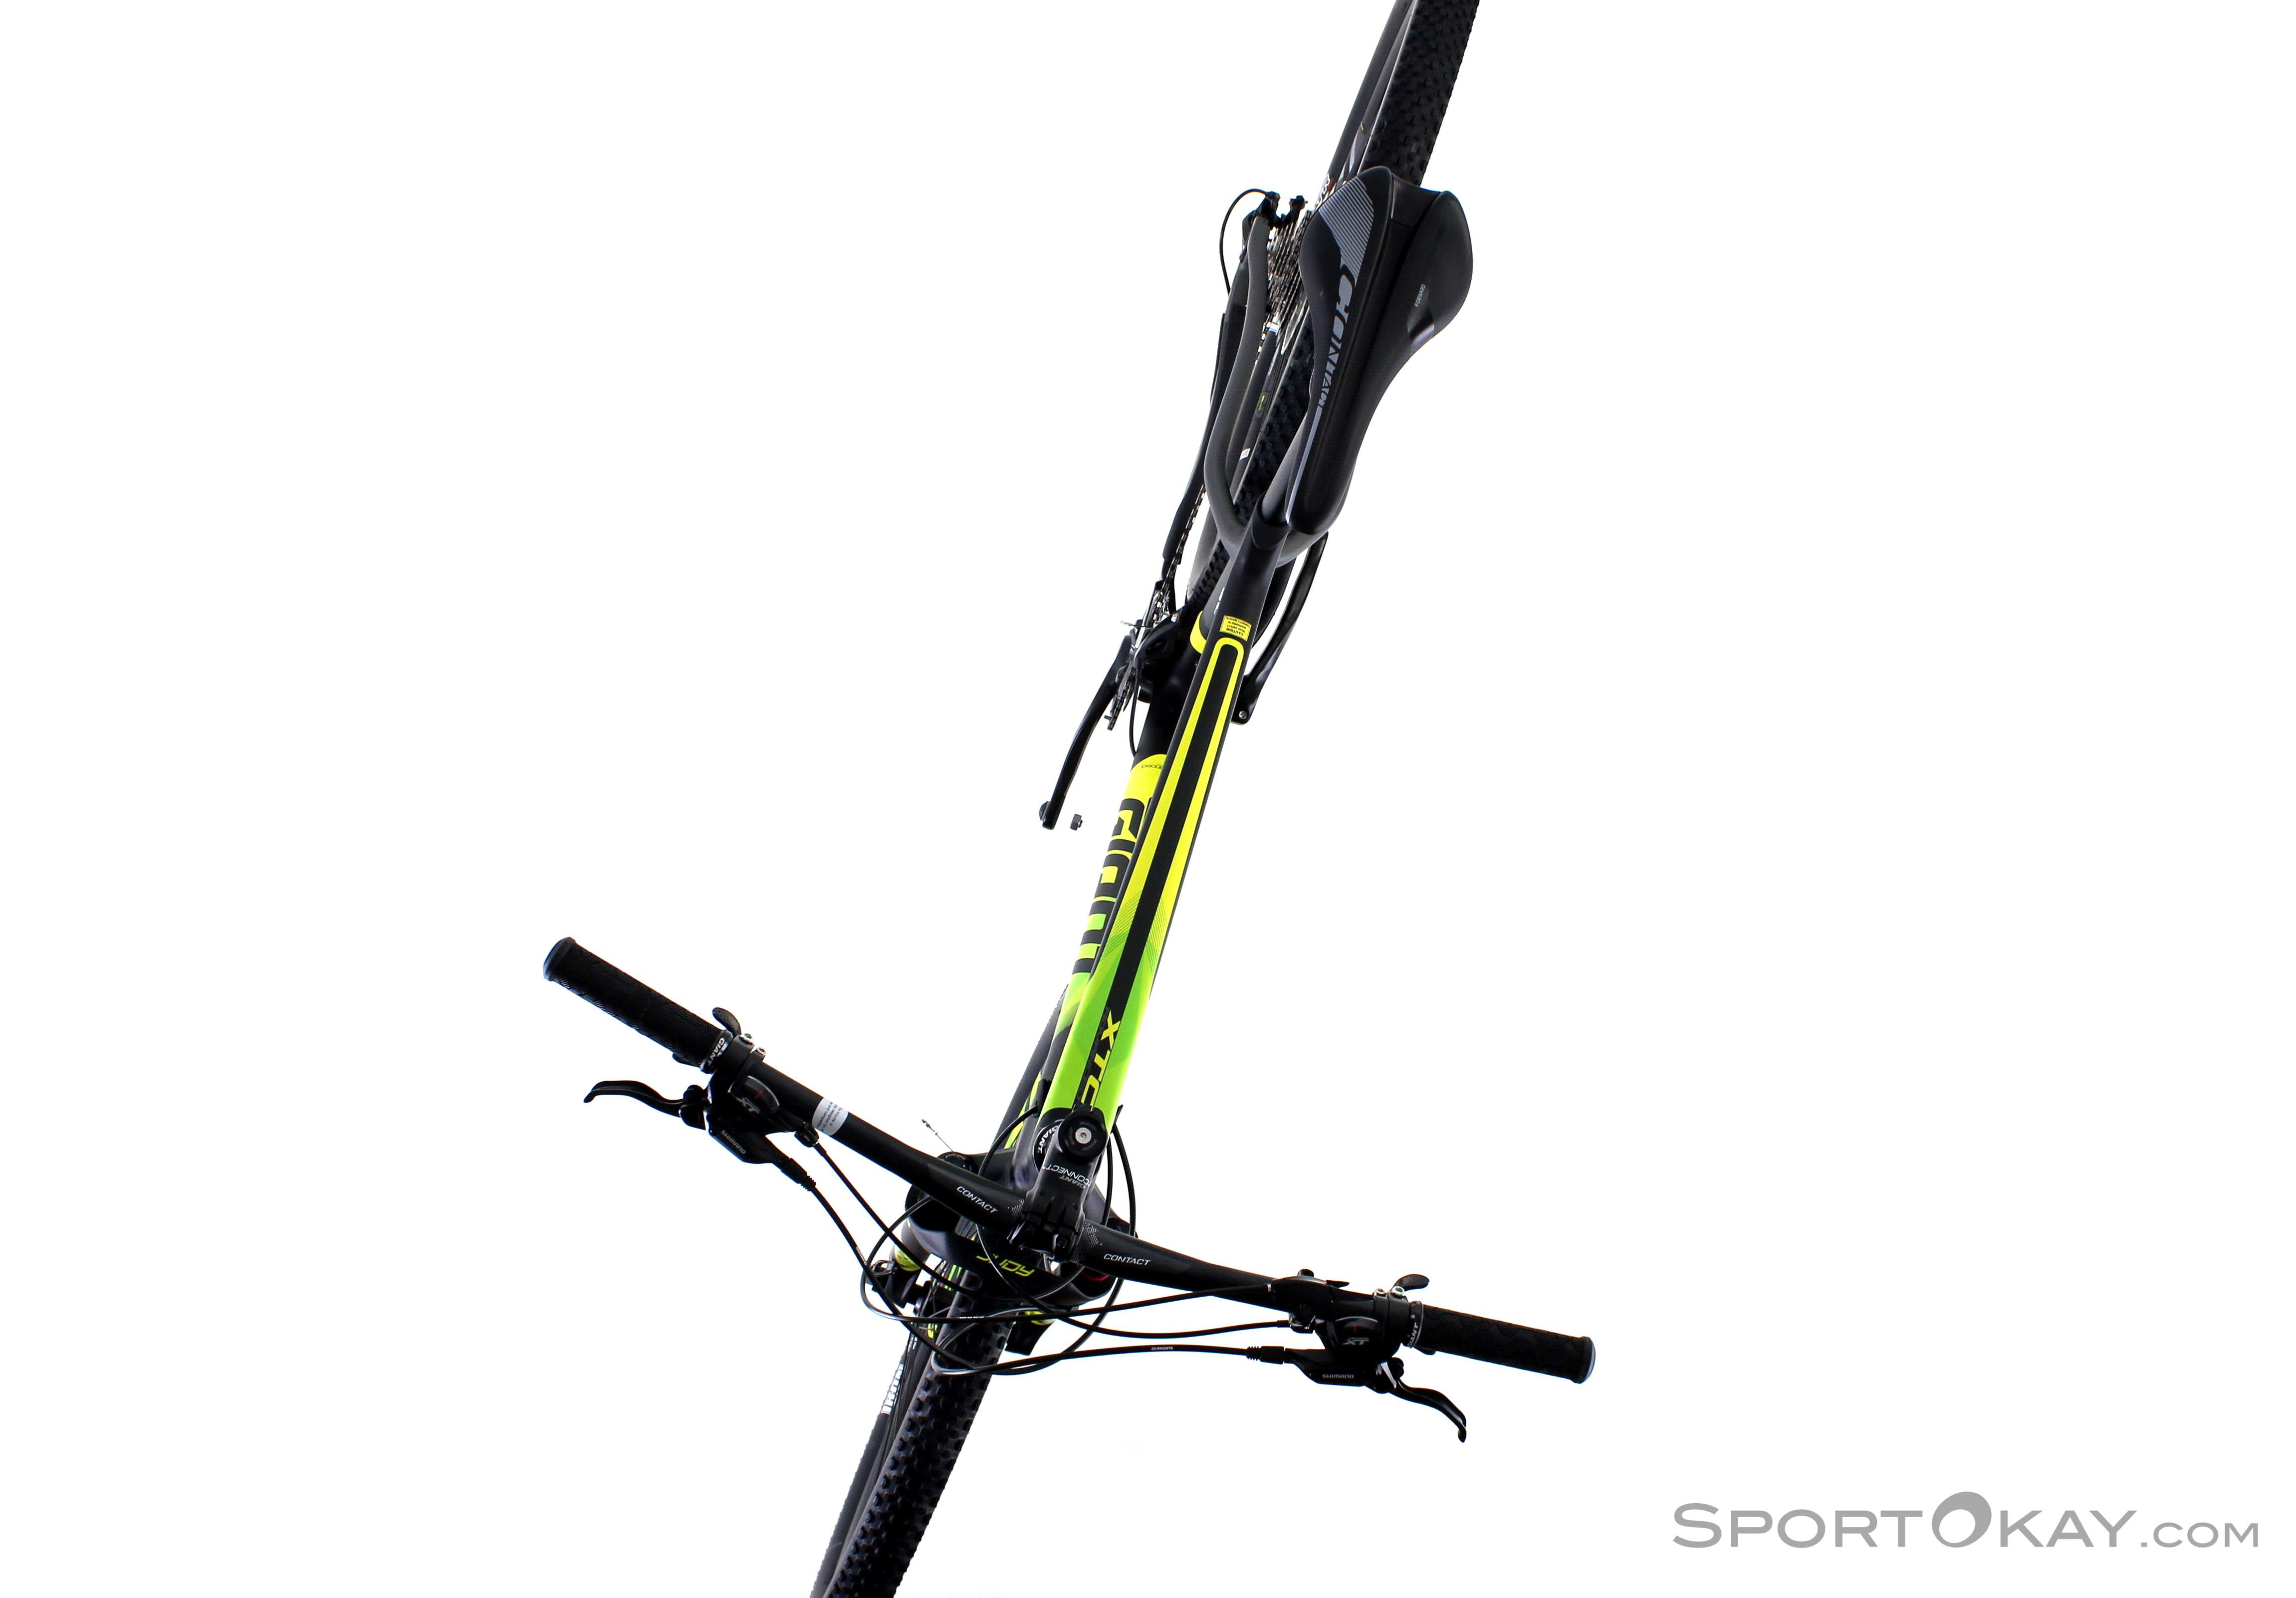 Giant Giant XTC Advanced 29 2 2018 Trail Bike